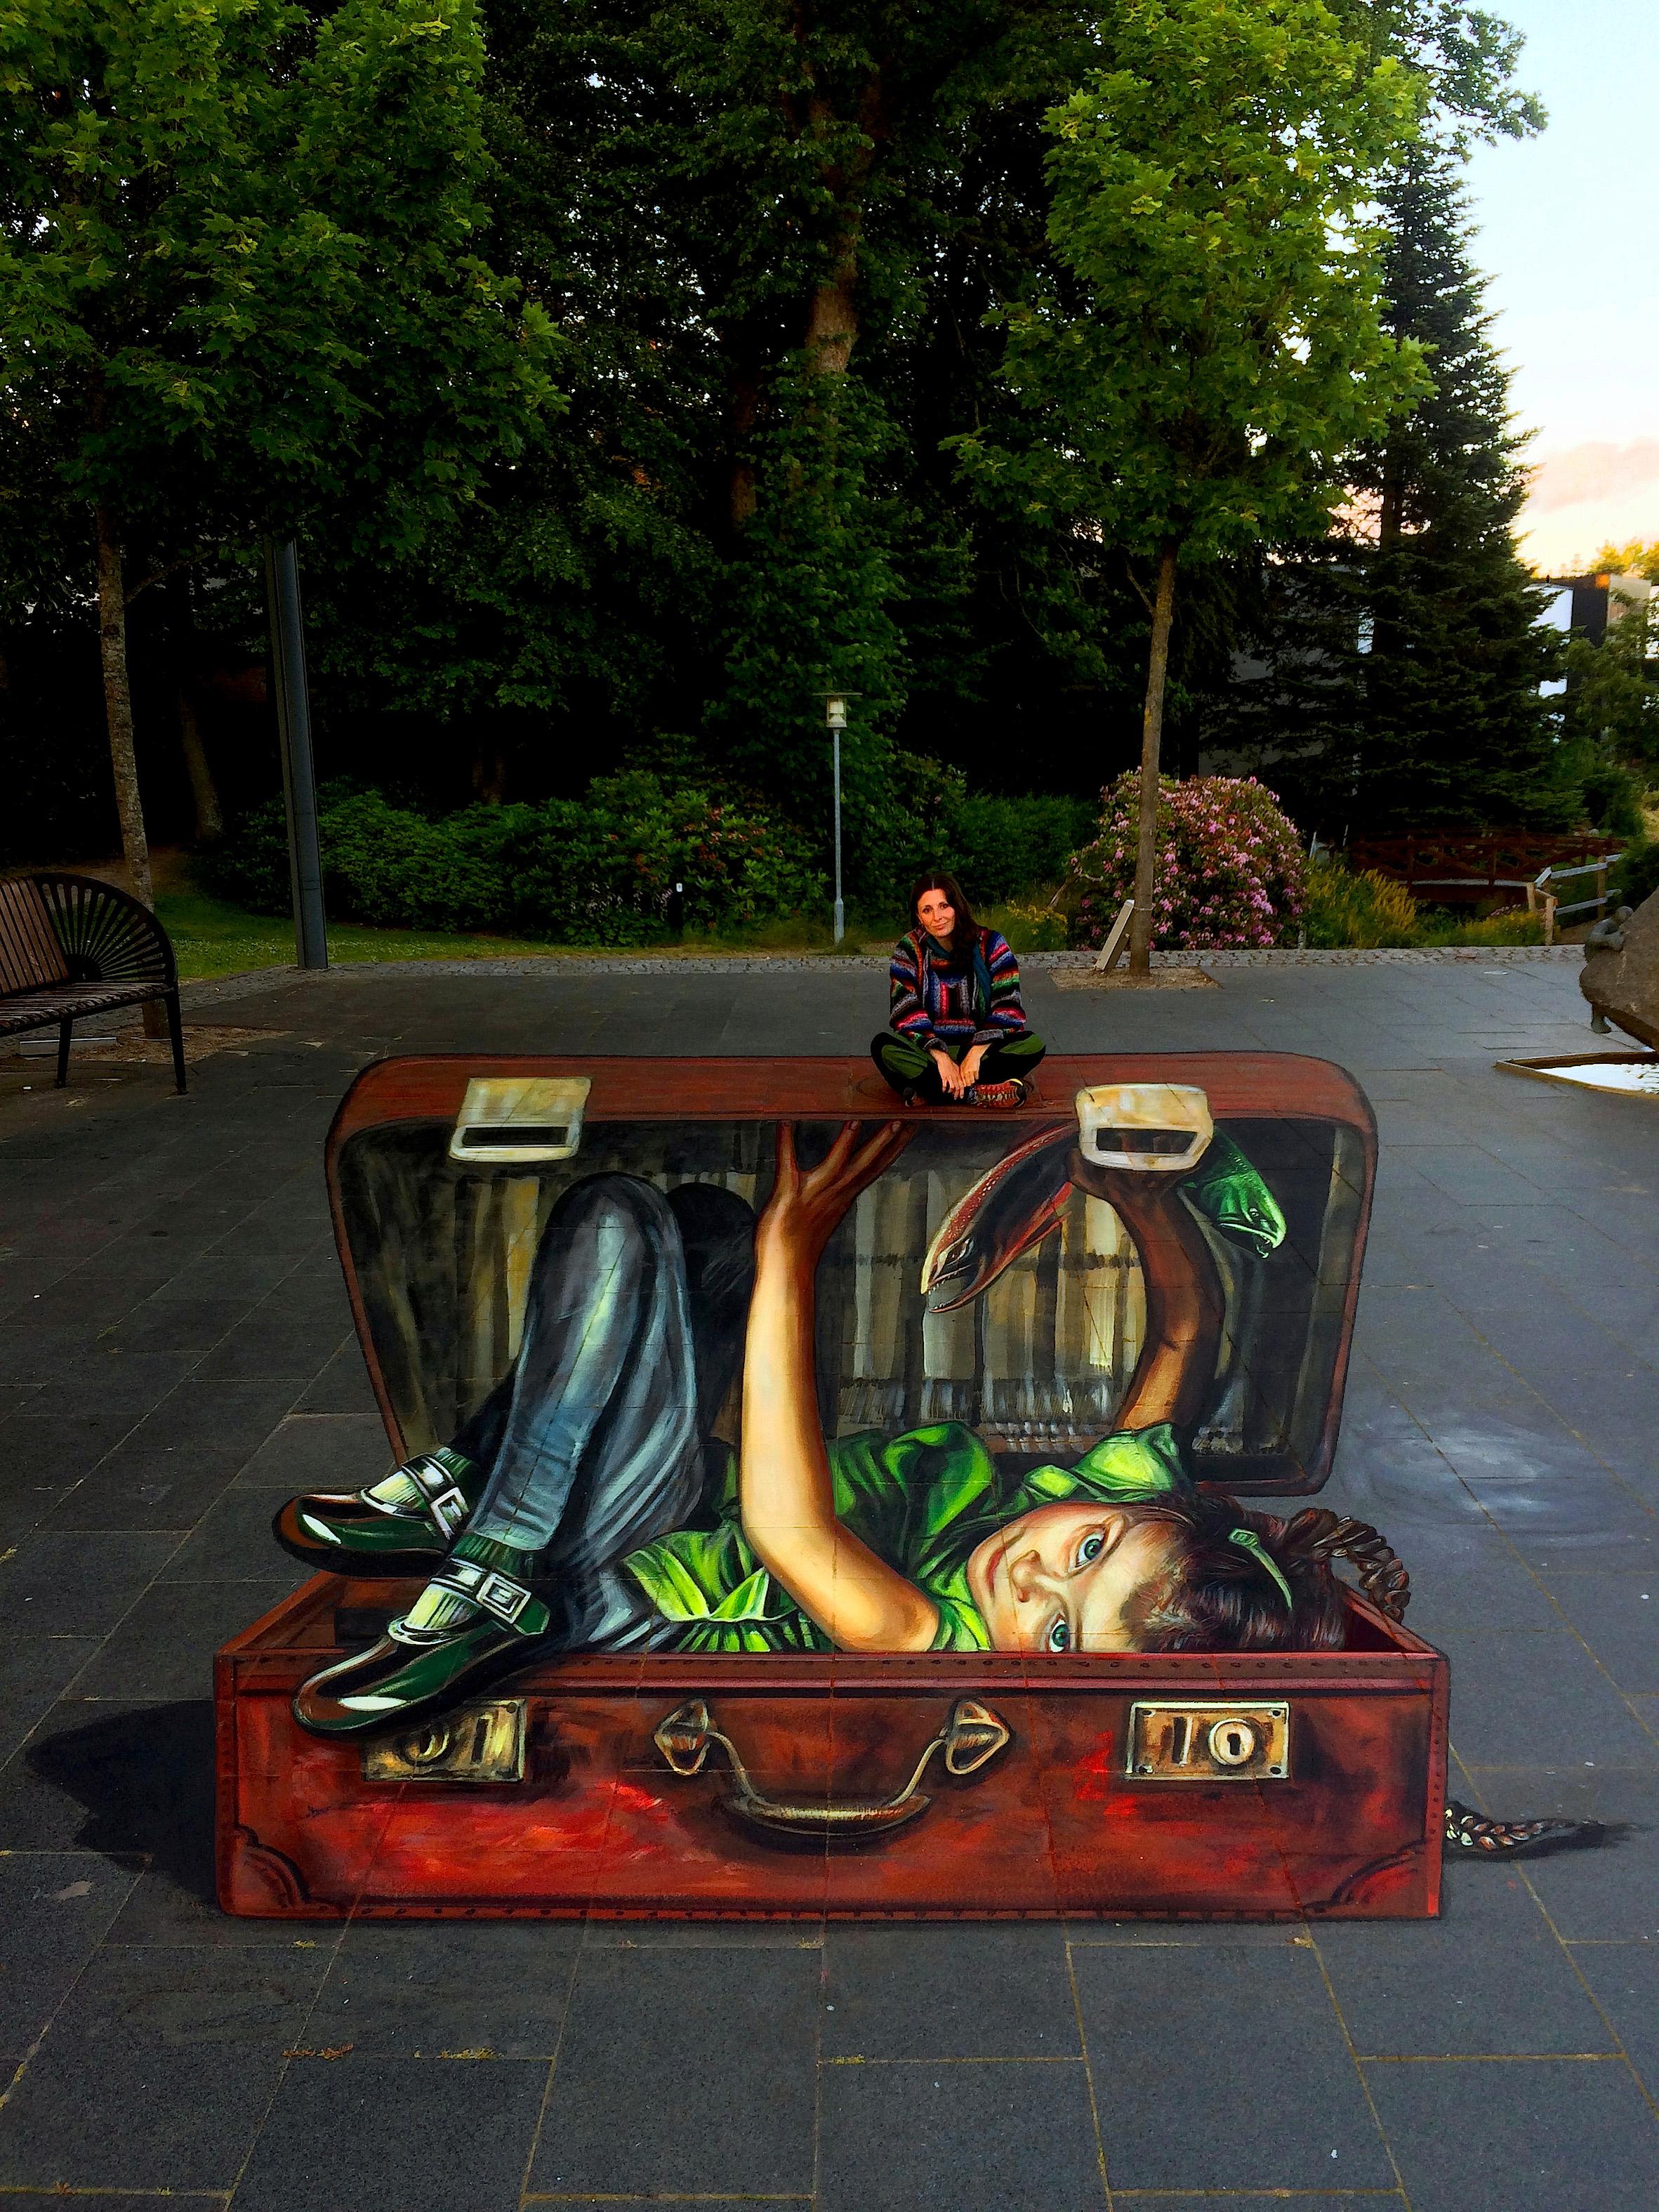 verabugatti streetart arteurbana illusioniottiche 3Dstreetart anamorfosi chisiamodadoveveniamo 3Dsuitcasse brandestreetartfestival shoesanamorfico anamorphic illusions urbanart madonnari3D